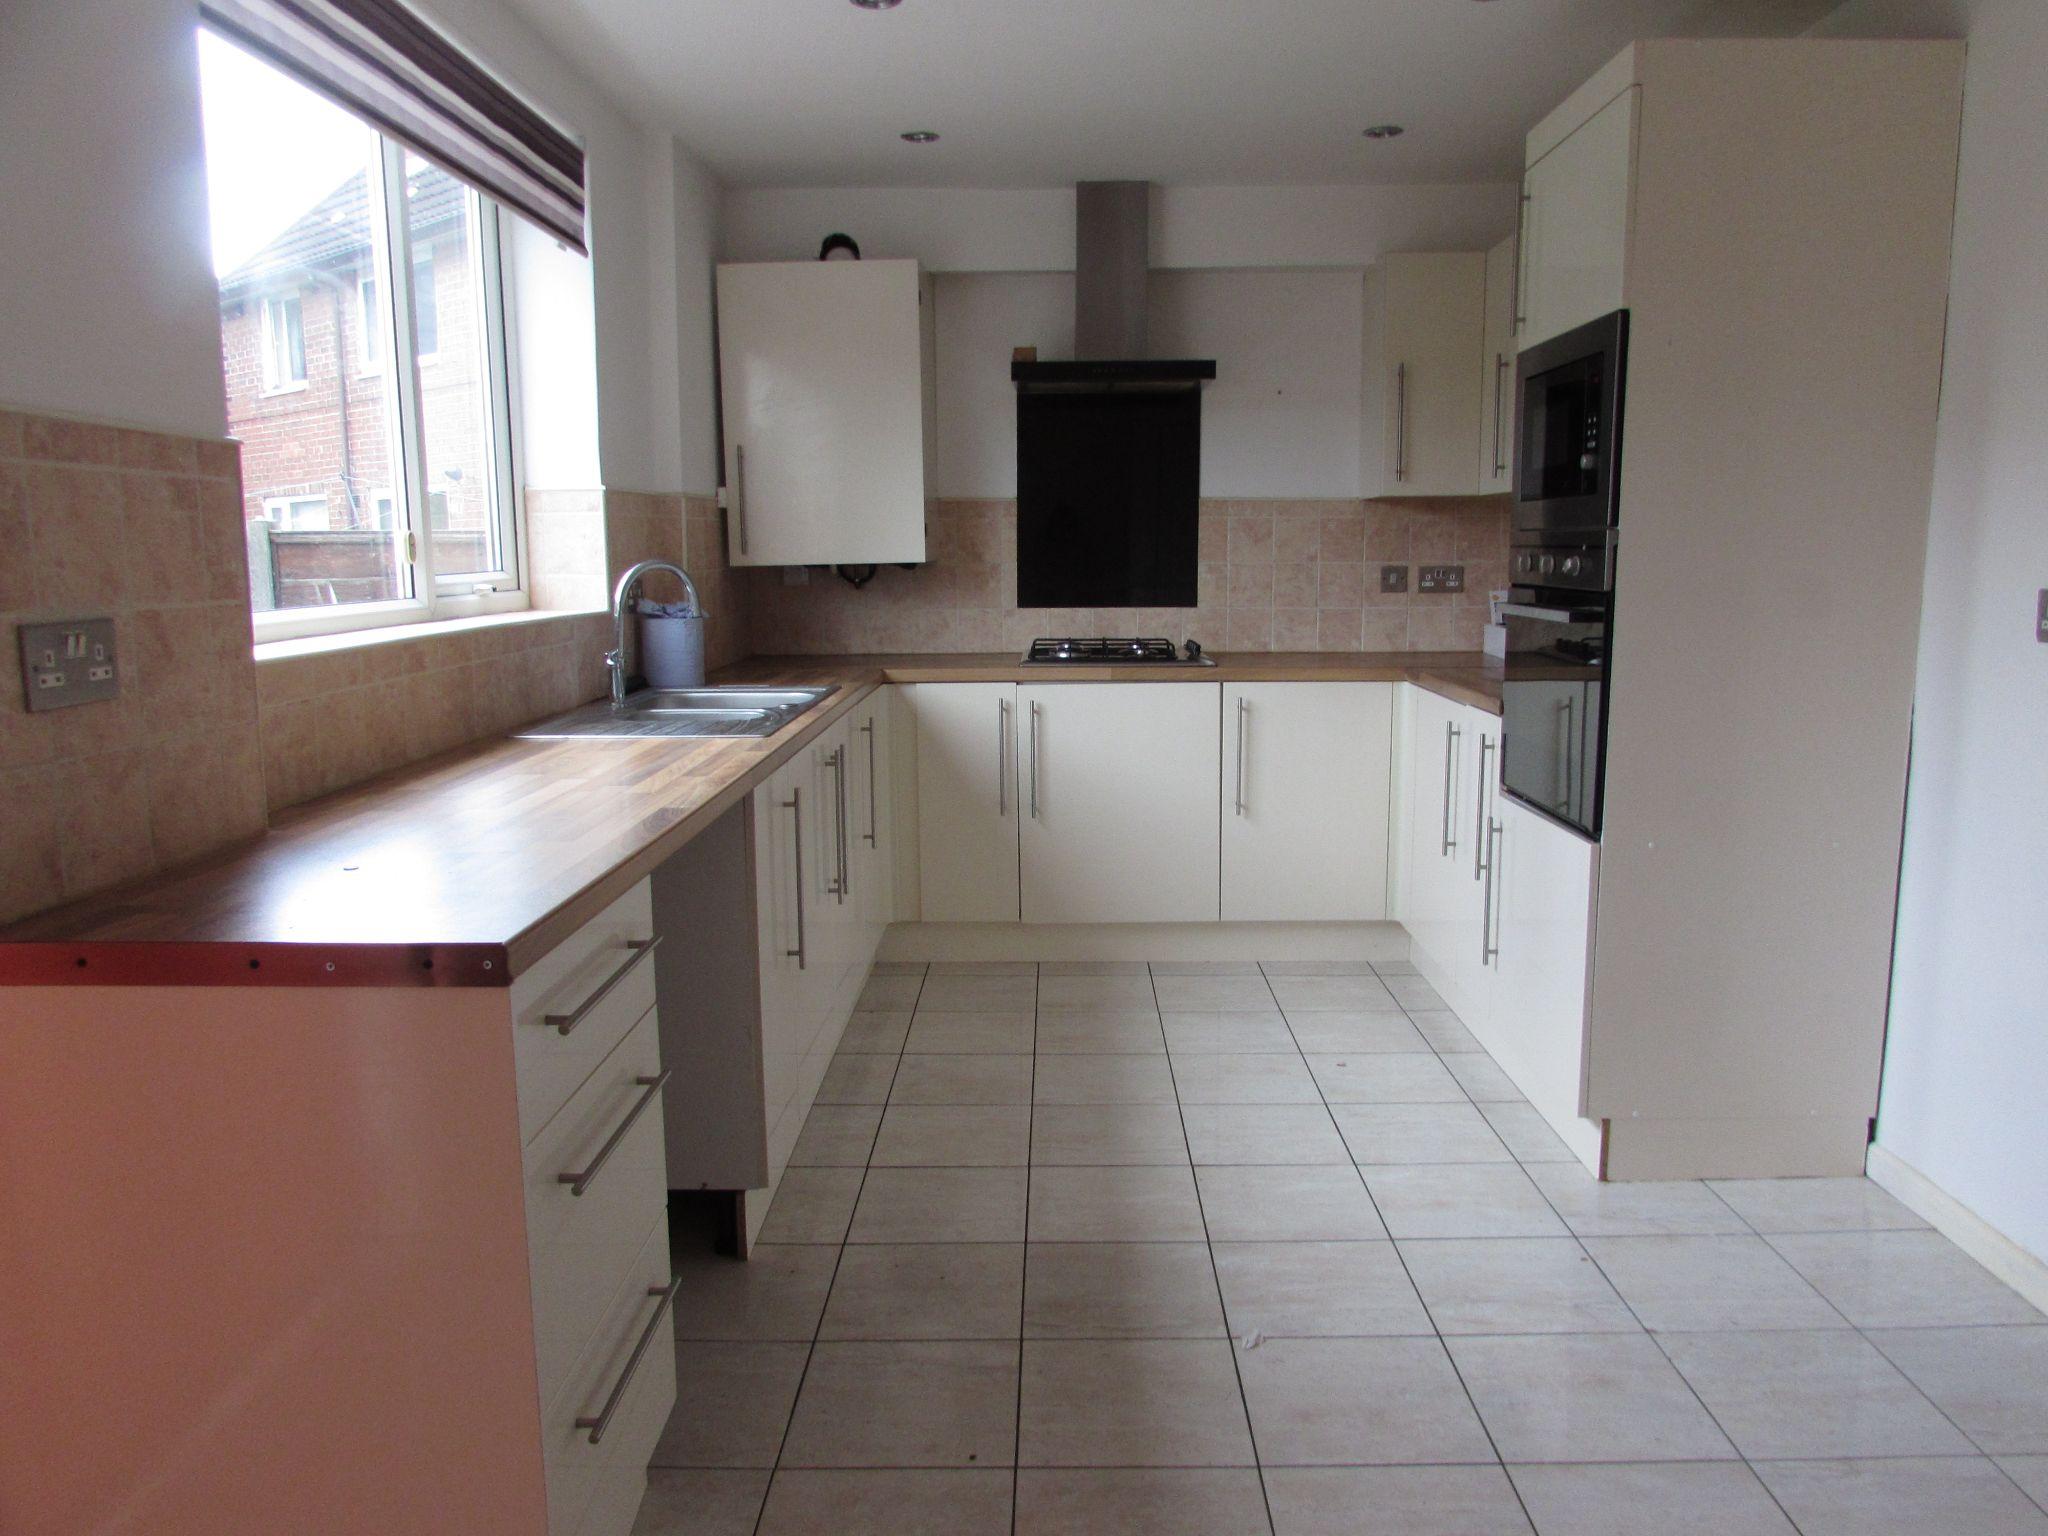 3 Bedroom Semi-detached House To Rent - Kitchen